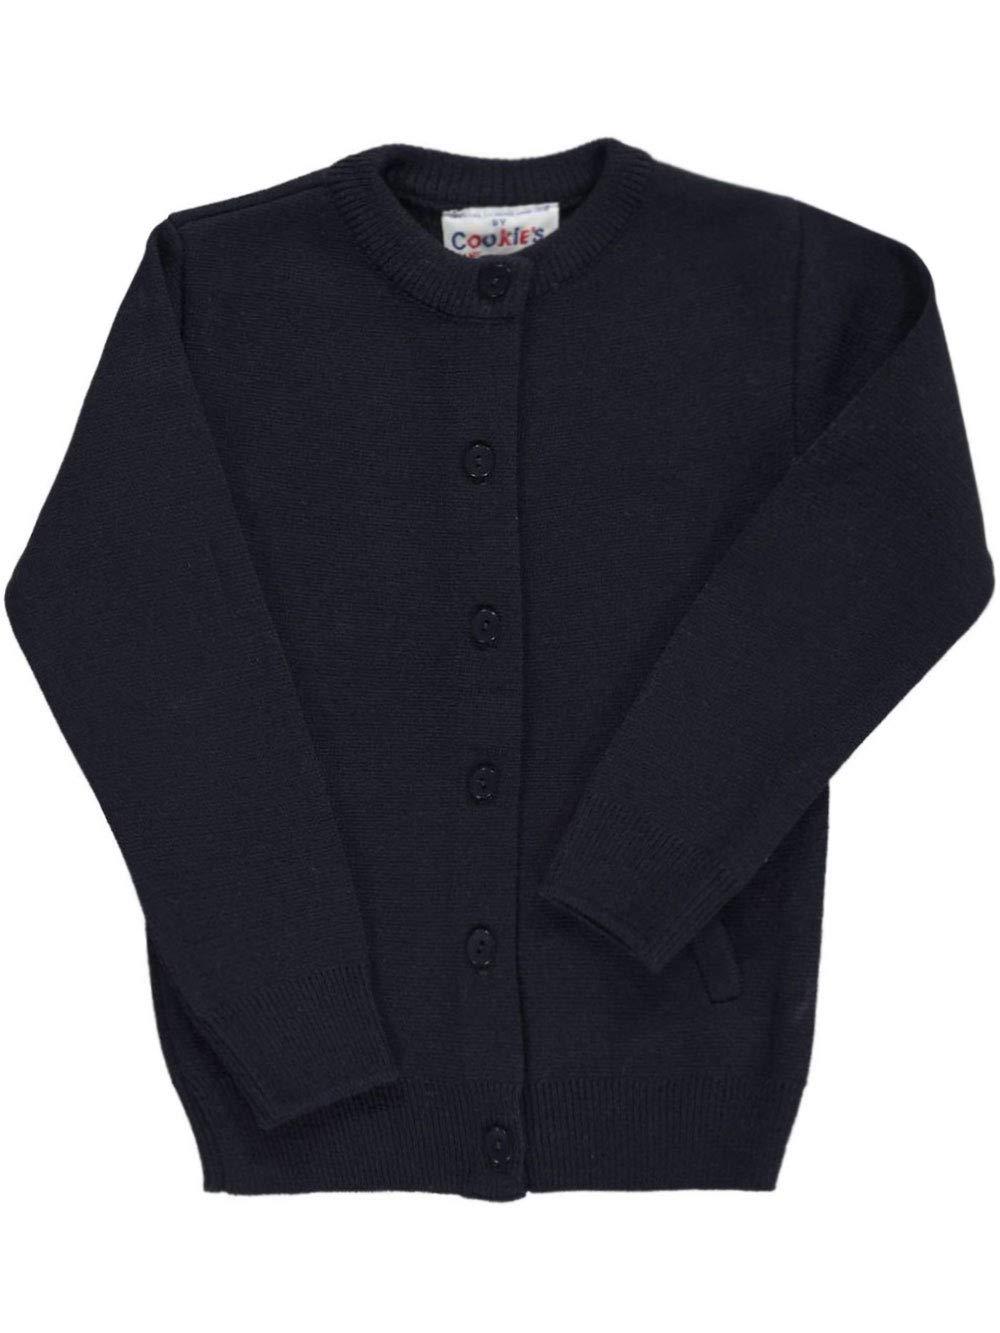 Cookie's Brand Big Girls' Crewneck Cardigan Sweater - Navy, 10 by Cookie's Kids (Image #1)